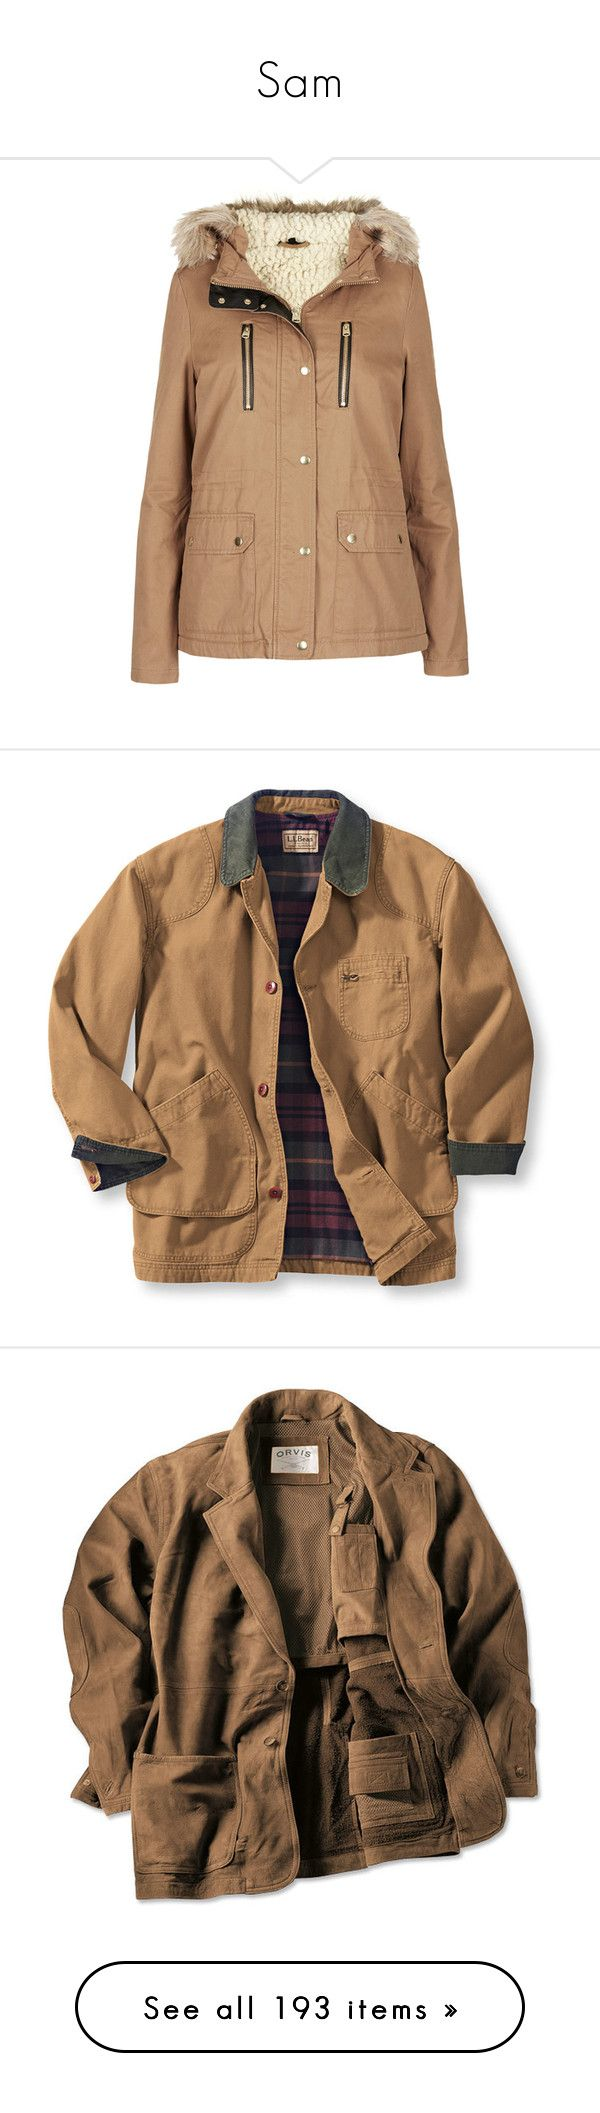 """Sam"" by isabelledupuis ❤ liked on Polyvore featuring outerwear, jackets, coats, coats & jackets, camel, padded parka, short parka, fur trimmed parka, topshop parka and fur hood parka"